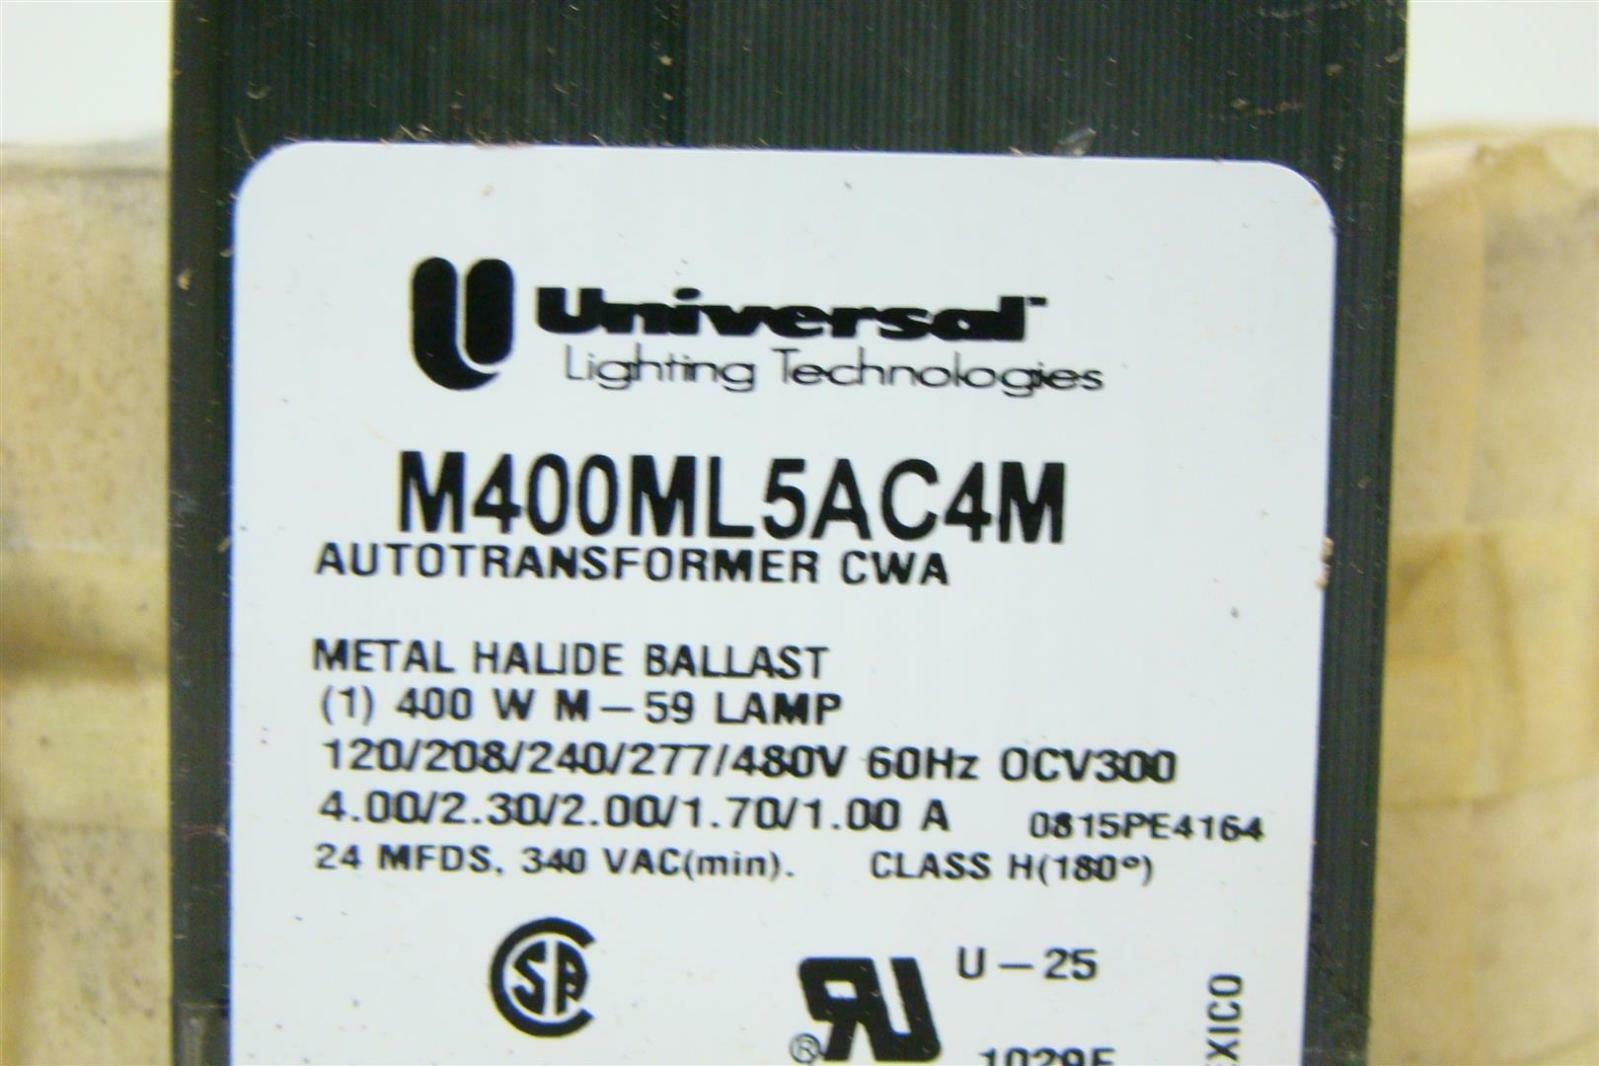 Universal Lighting Technologies Metal Halide Ballast M400ML5AC4M Universal Lighting Technologies Metal Halide Ballast M400ML5AC4M ... & Universal Lighting Technologies Metal Halide Ballast M400ML5AC4M ... azcodes.com